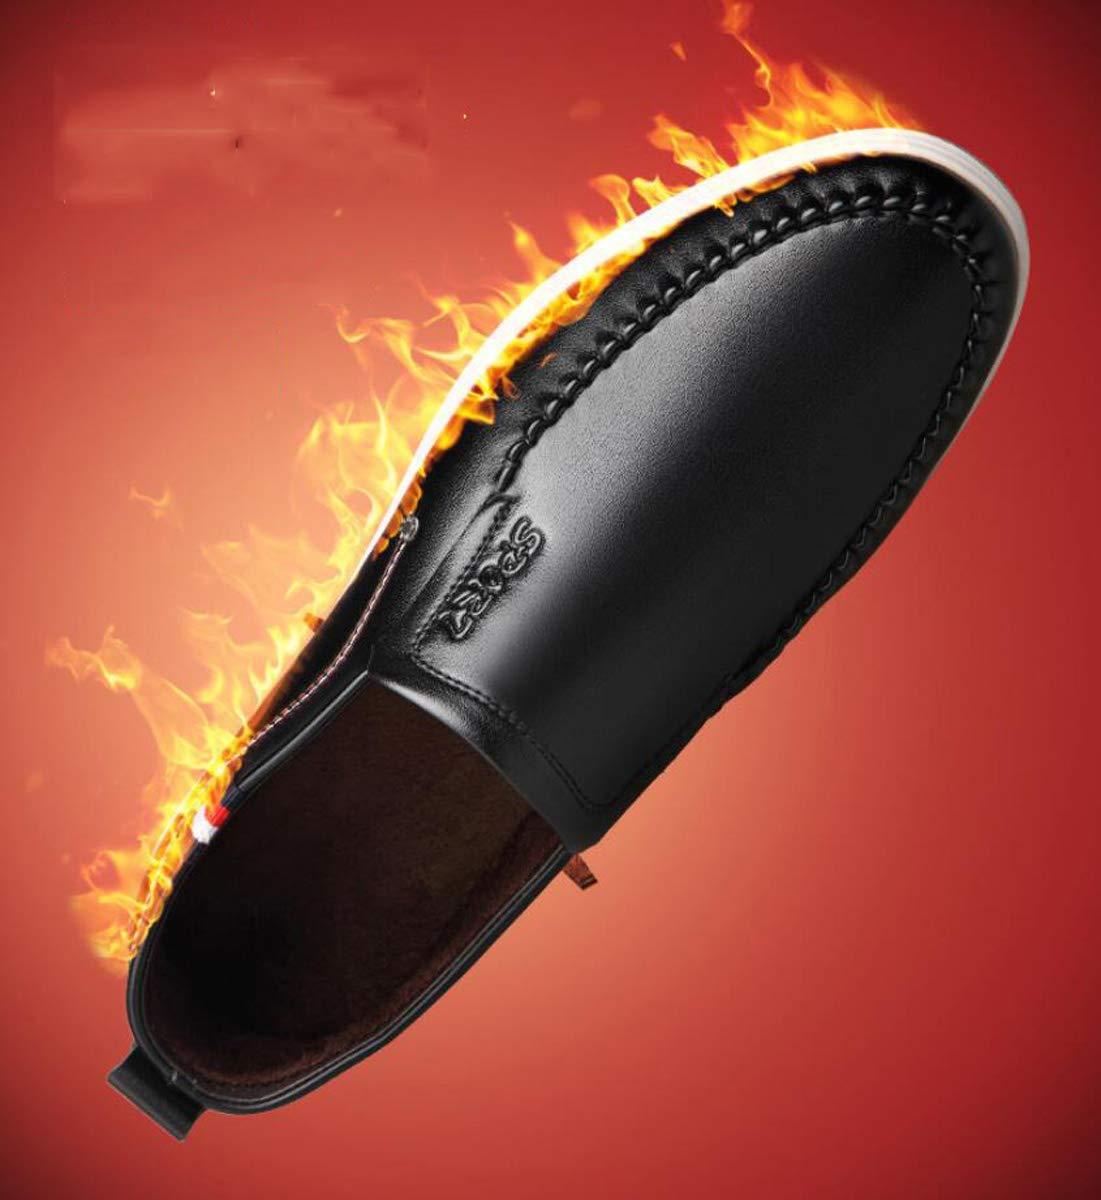 DANDANJIE Herren Freizeitschuhe Slip On Lederschuhe Winter Warm Low Low Low Top Driving Schuhe Rutschfeste Müßiggänger Schwarz,schwarz,41EU  232c0a